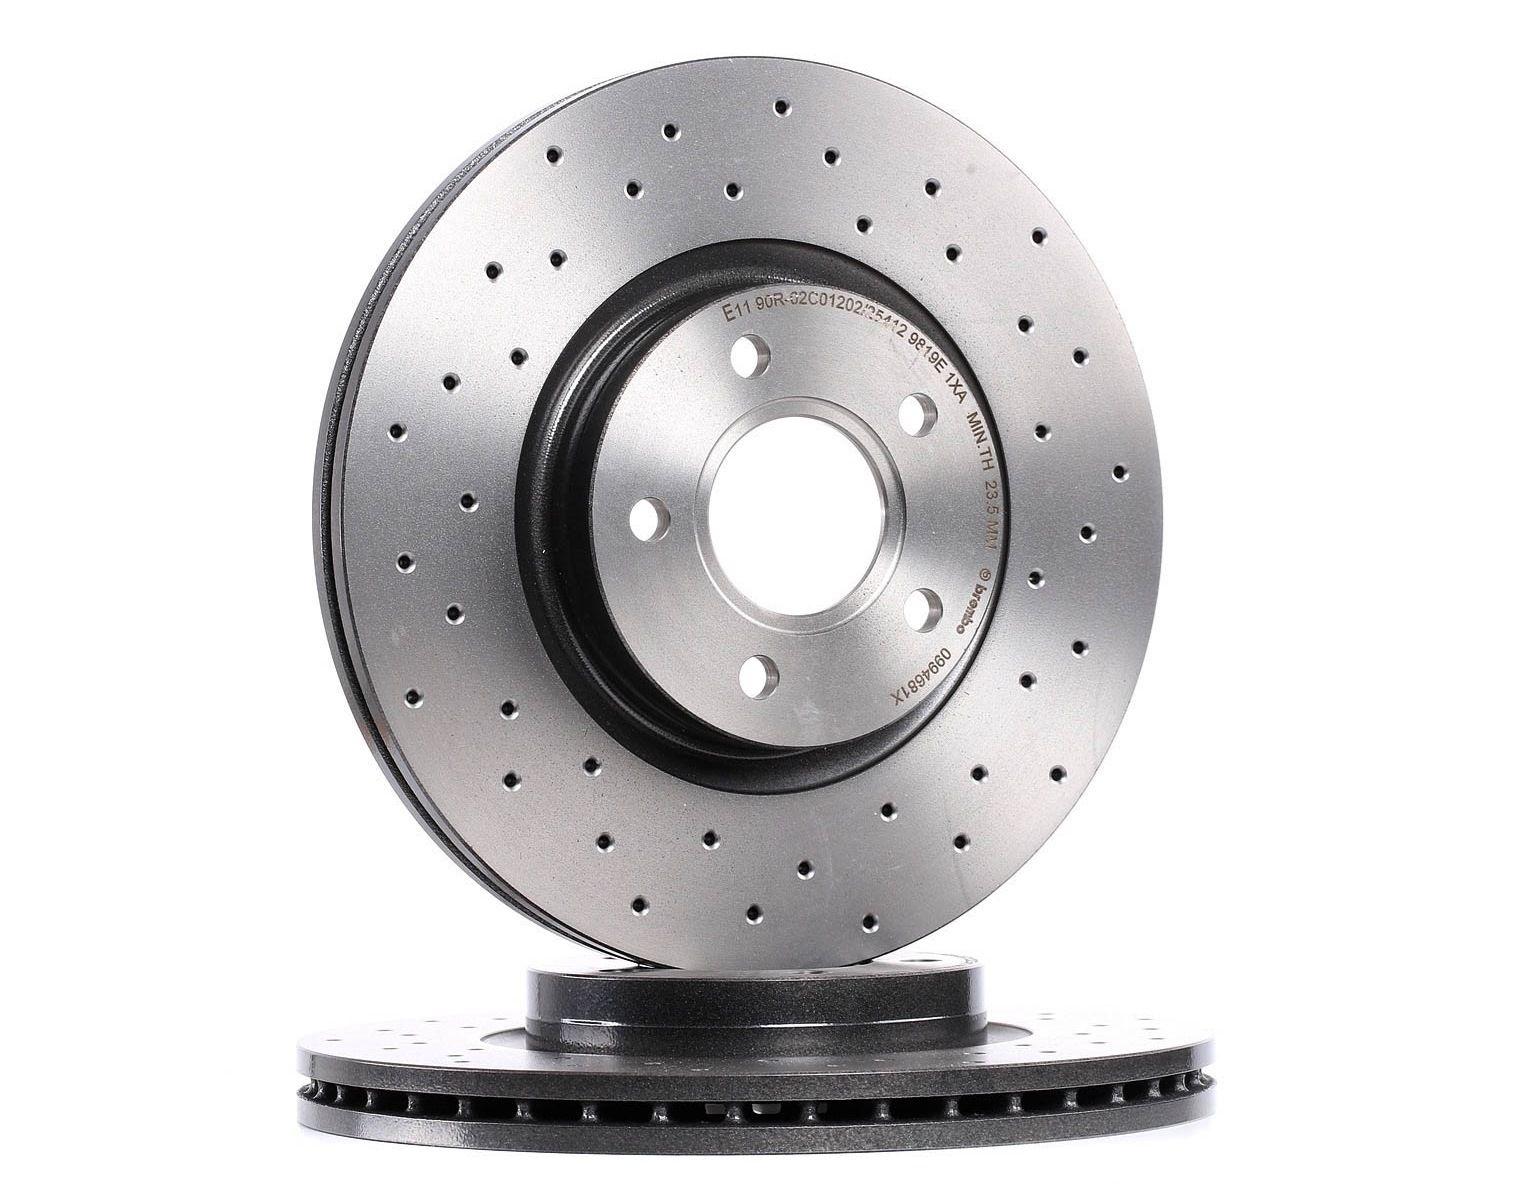 Buy Brake discs BREMBO 09.9468.1X Ø: 300mm, Num. of holes: 5, Brake Disc Thickness: 25mm